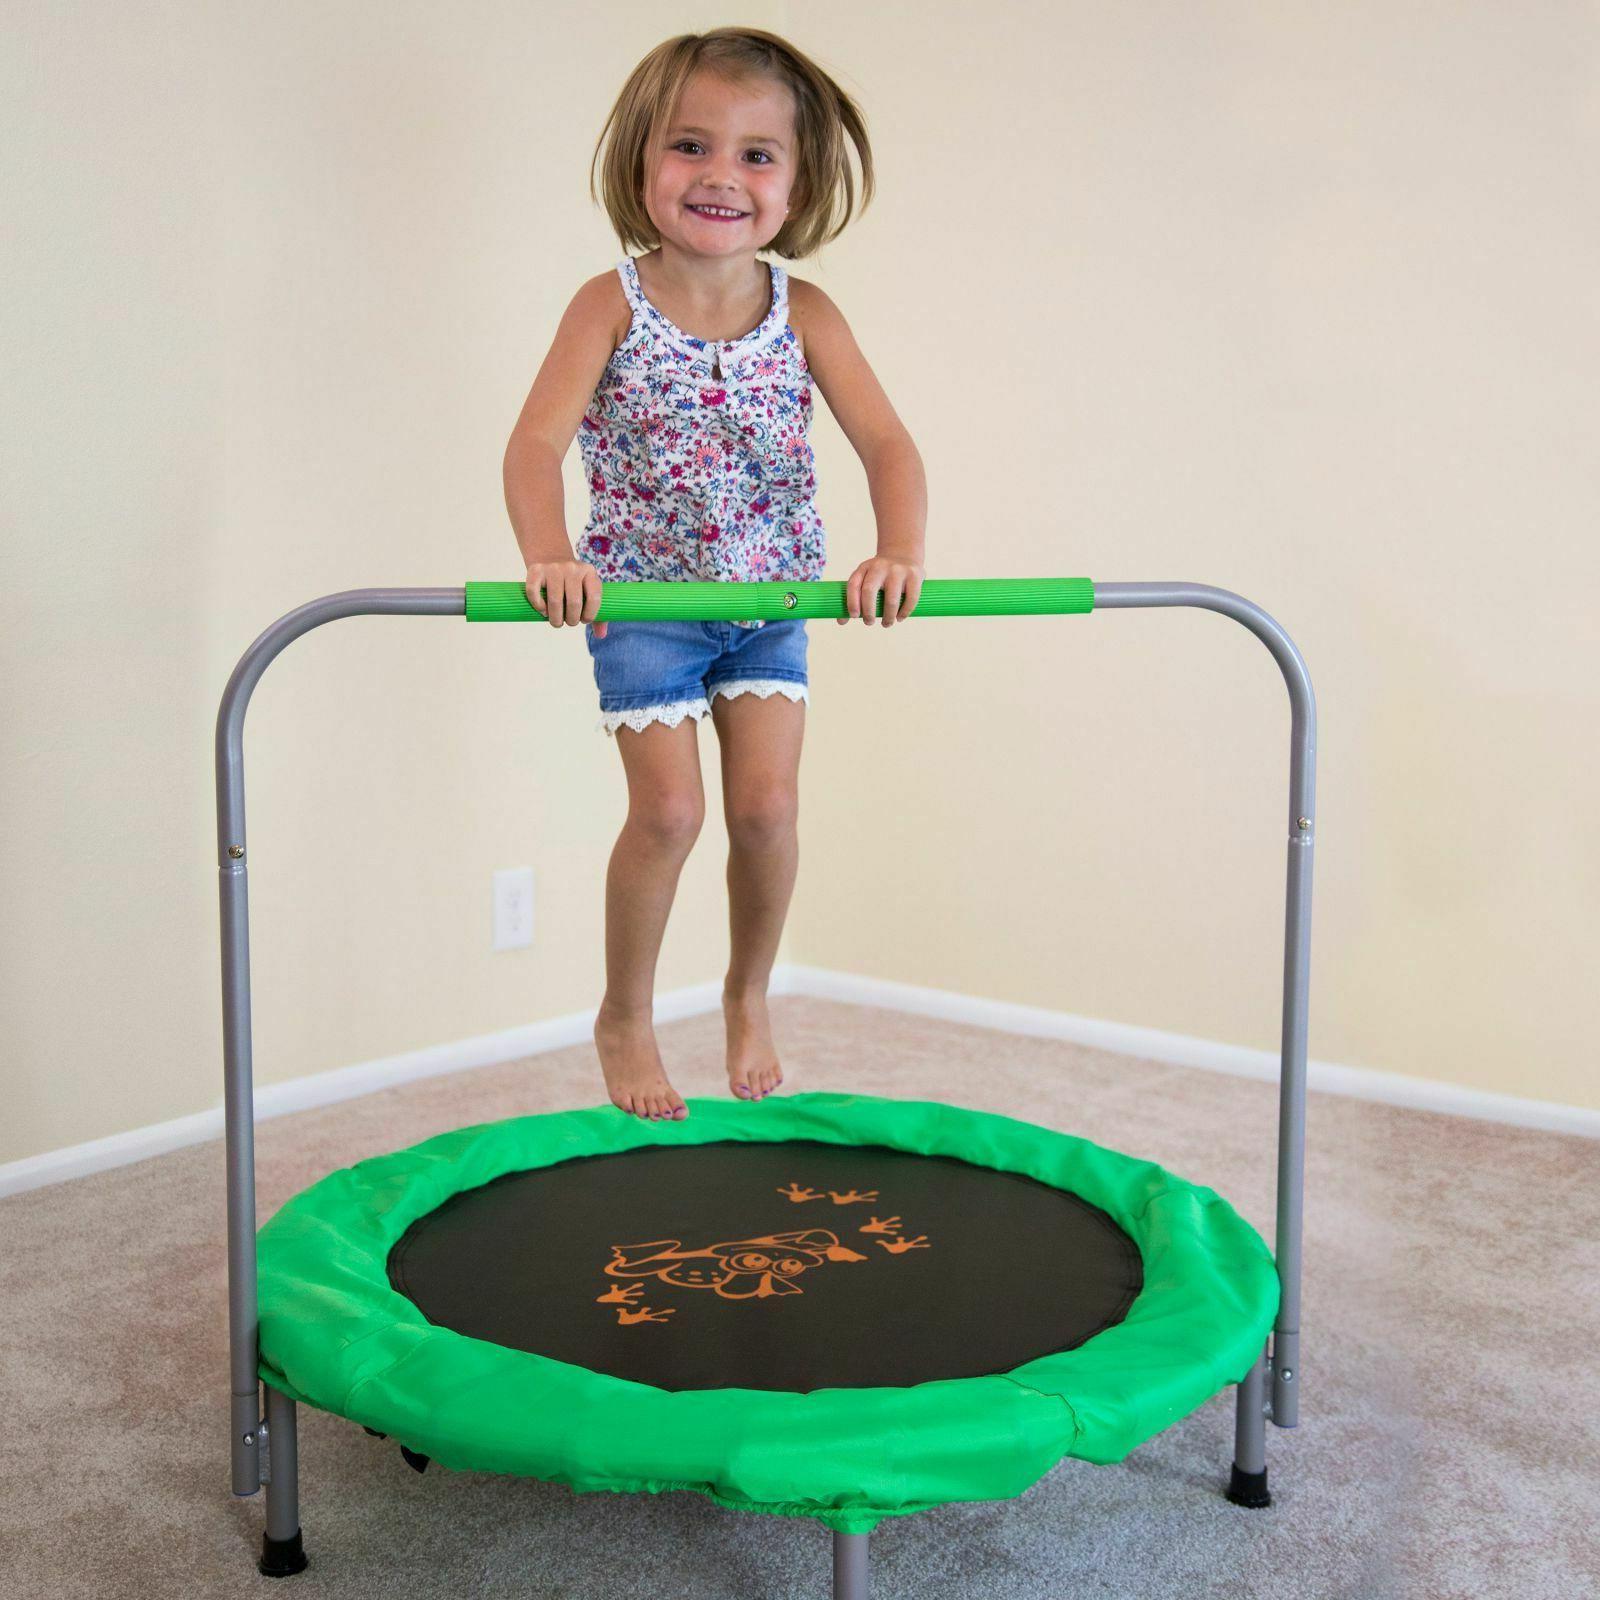 skywalker trampolines 36 inch bouncer green powder